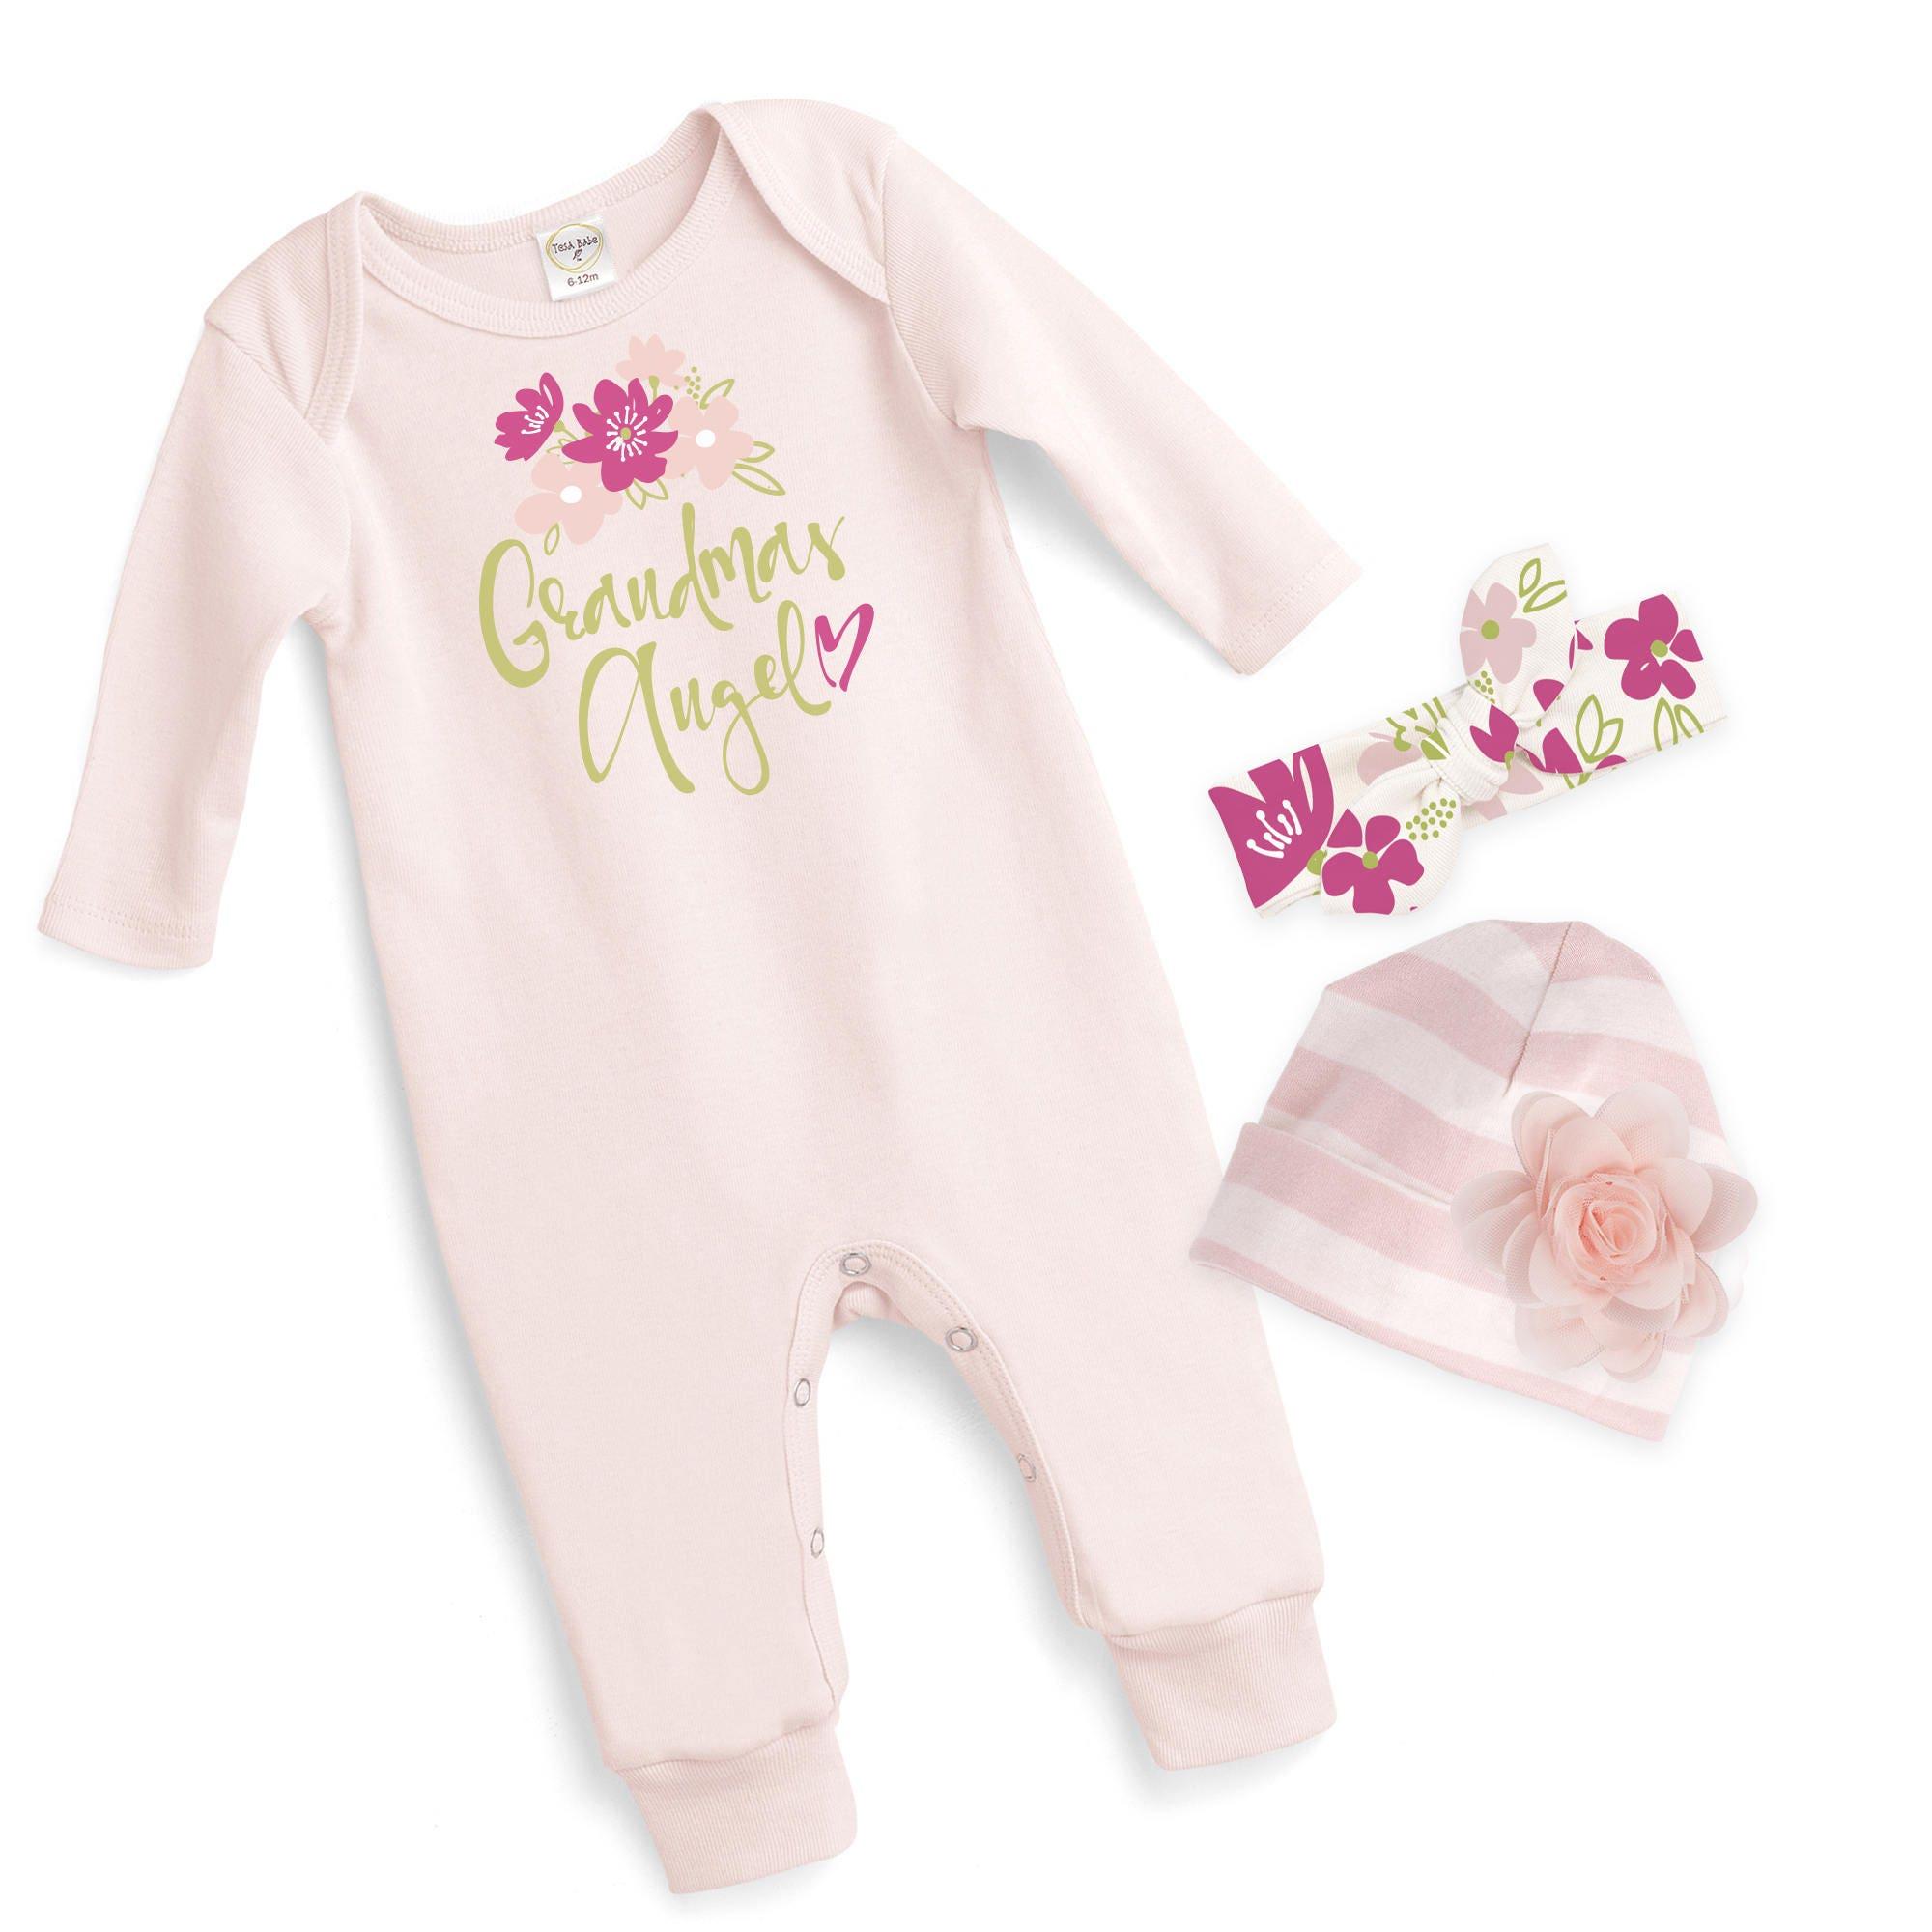 Grandma S Baby Girl Outfit Newborn Baby Girl Coming Home Gift Baby